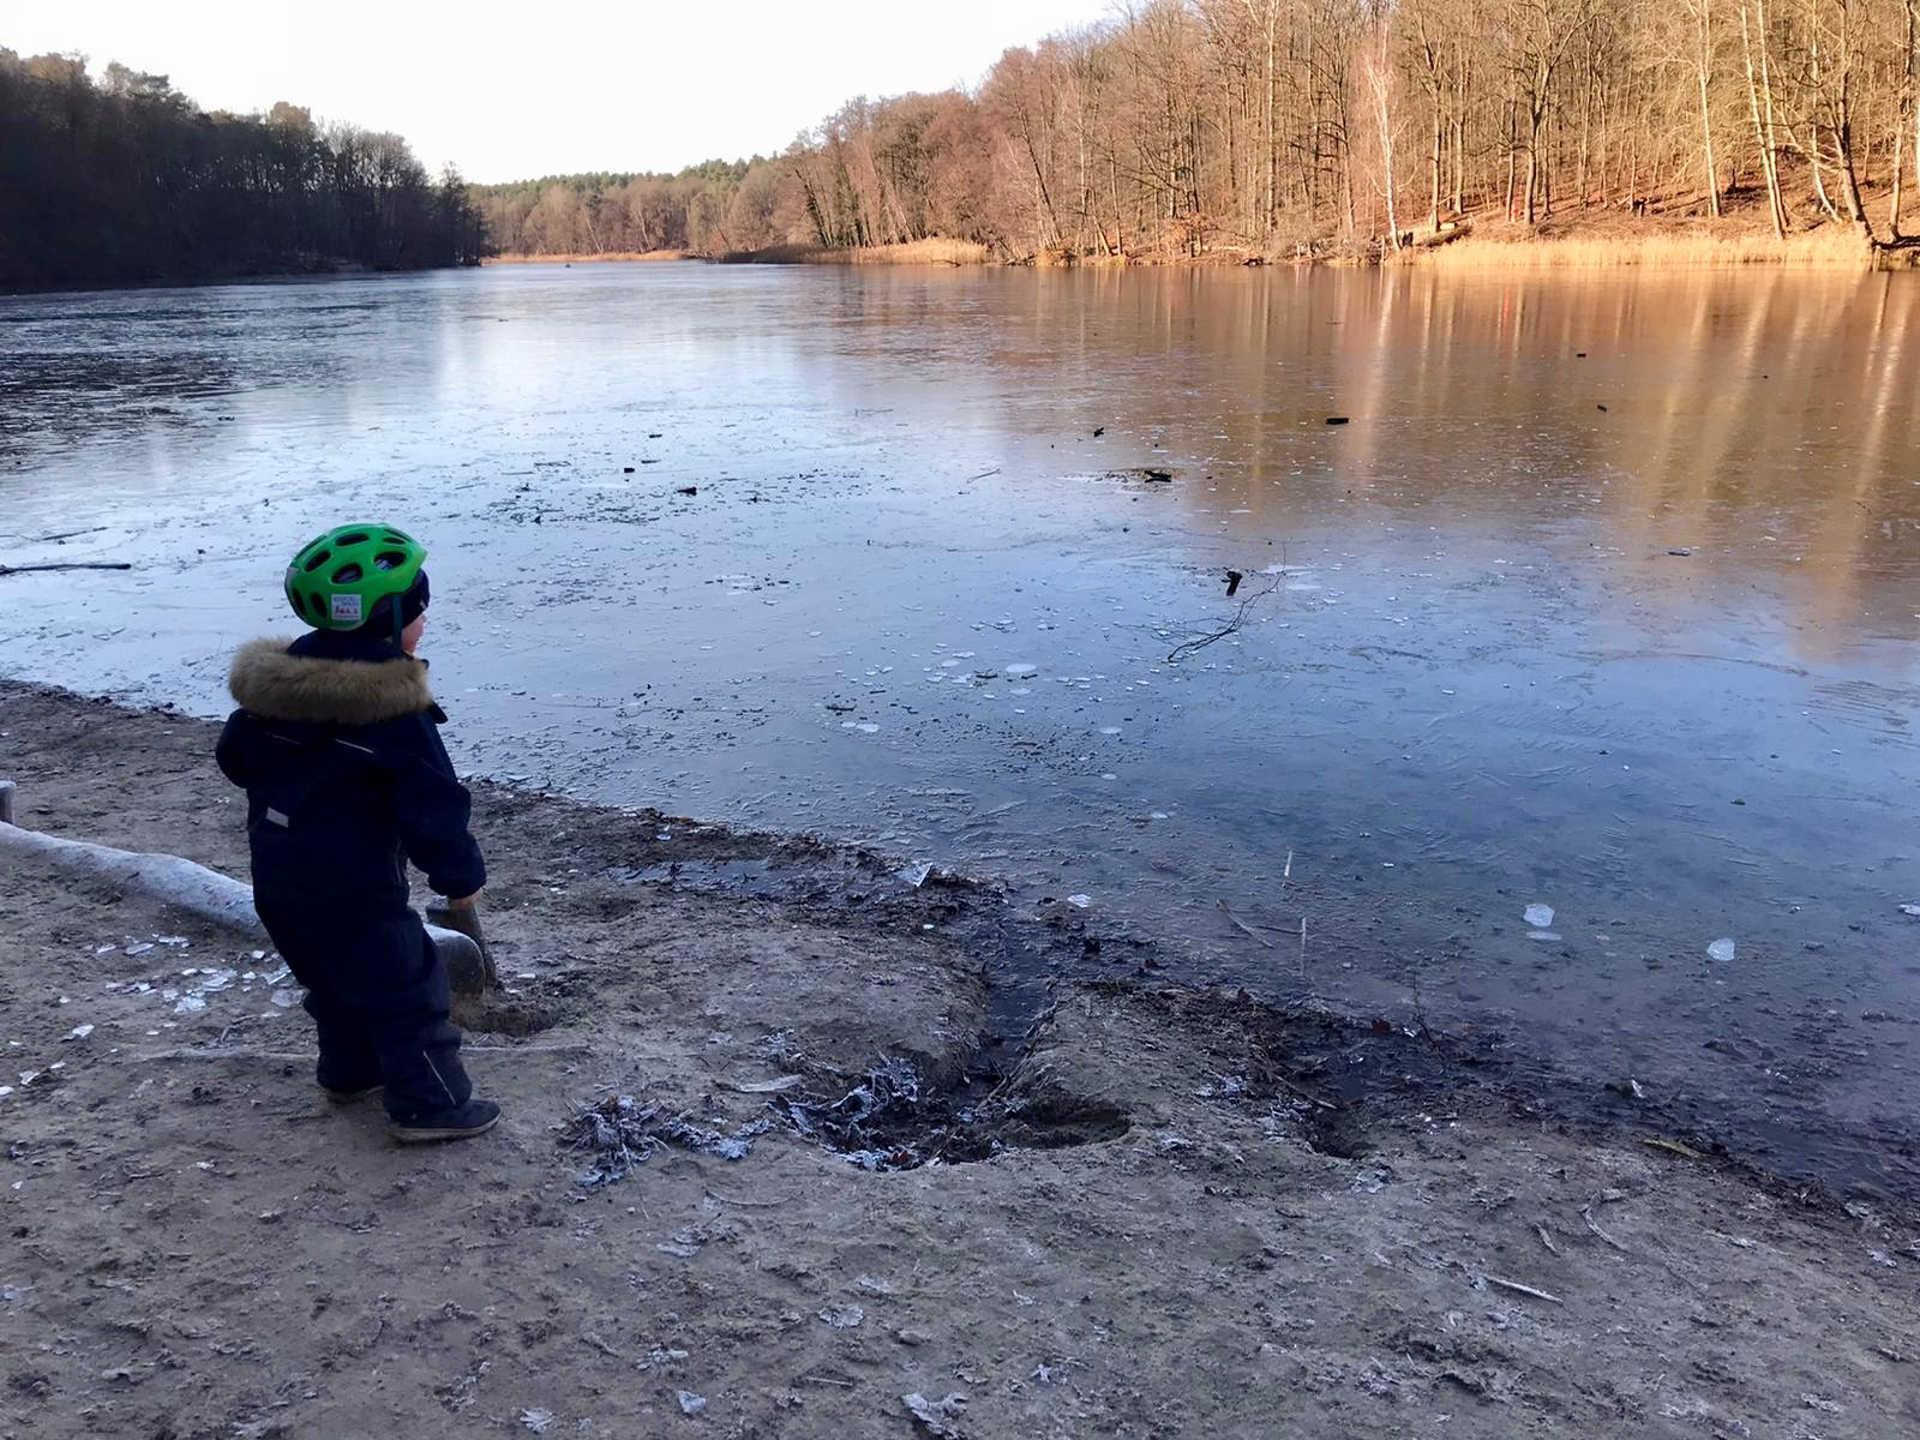 Winter4nature: Aktiv mit Kind am See